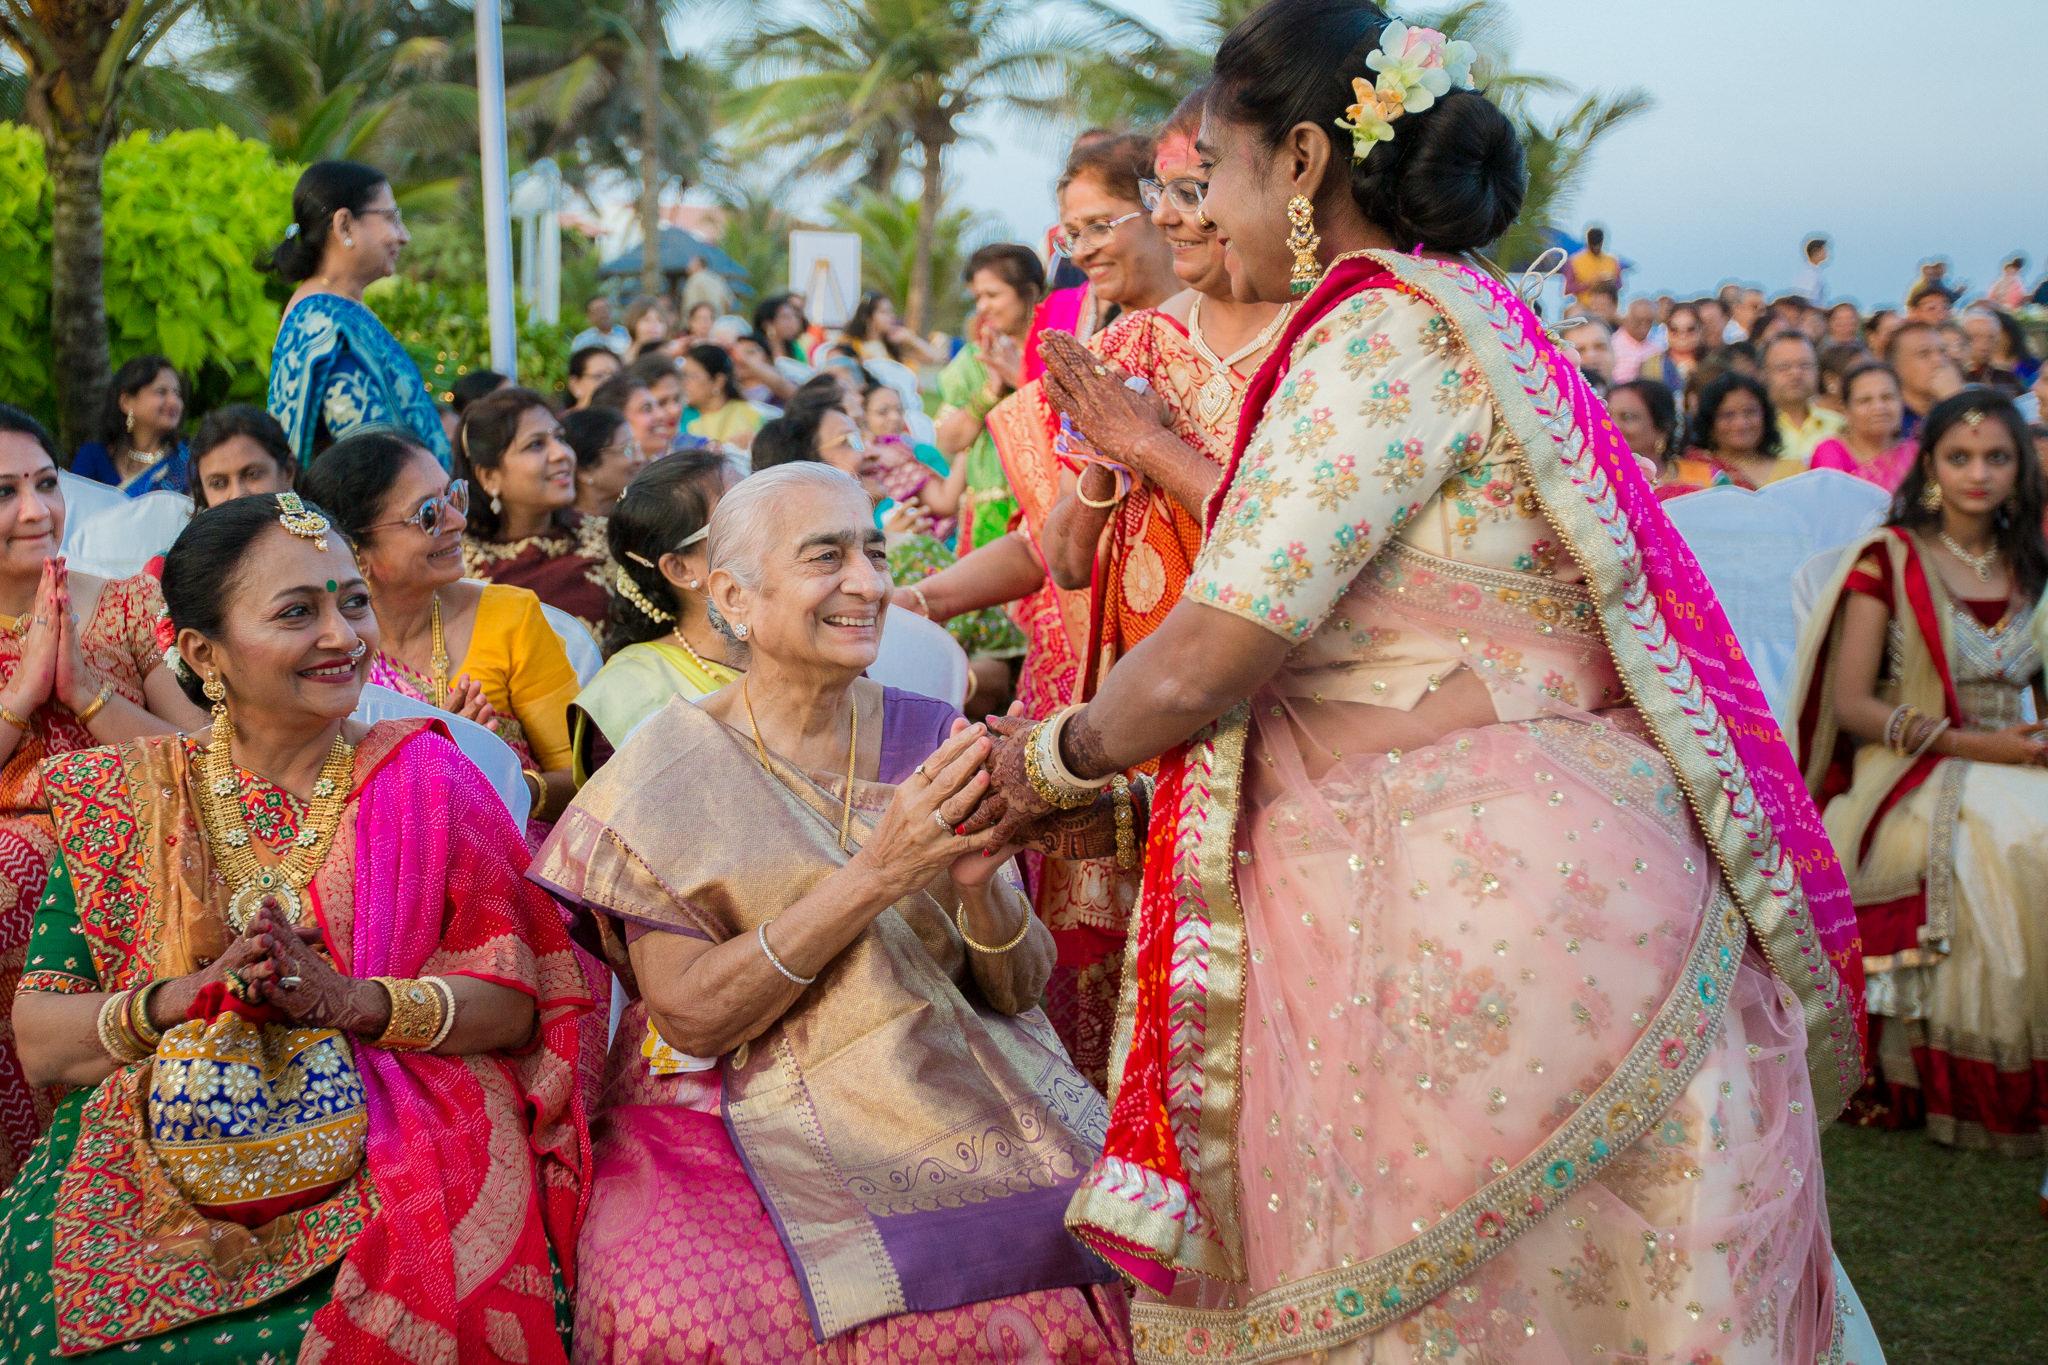 RushabhRiddhi_DestinationWedding_TempleBay_Mahabalipuram_091.jpg